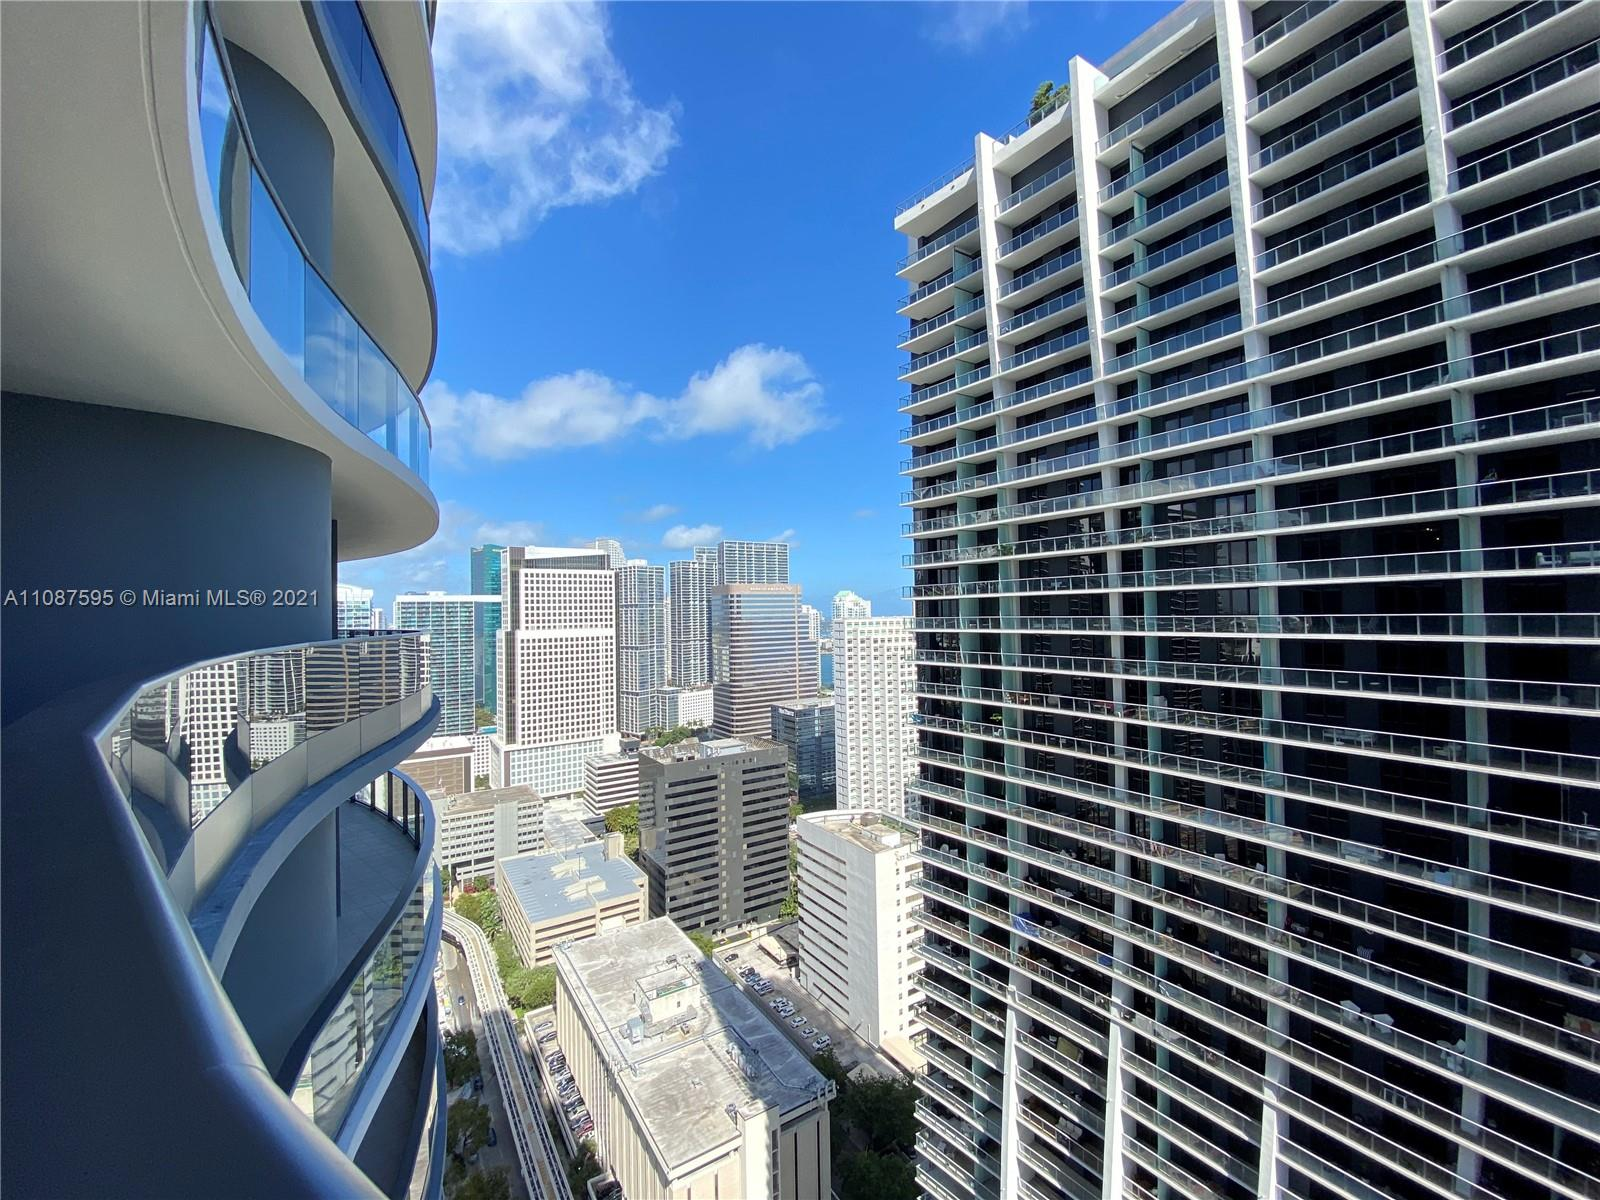 Brickell FlatIron #3807 - 1000 Brickell Plaza #3807, Miami, FL 33131